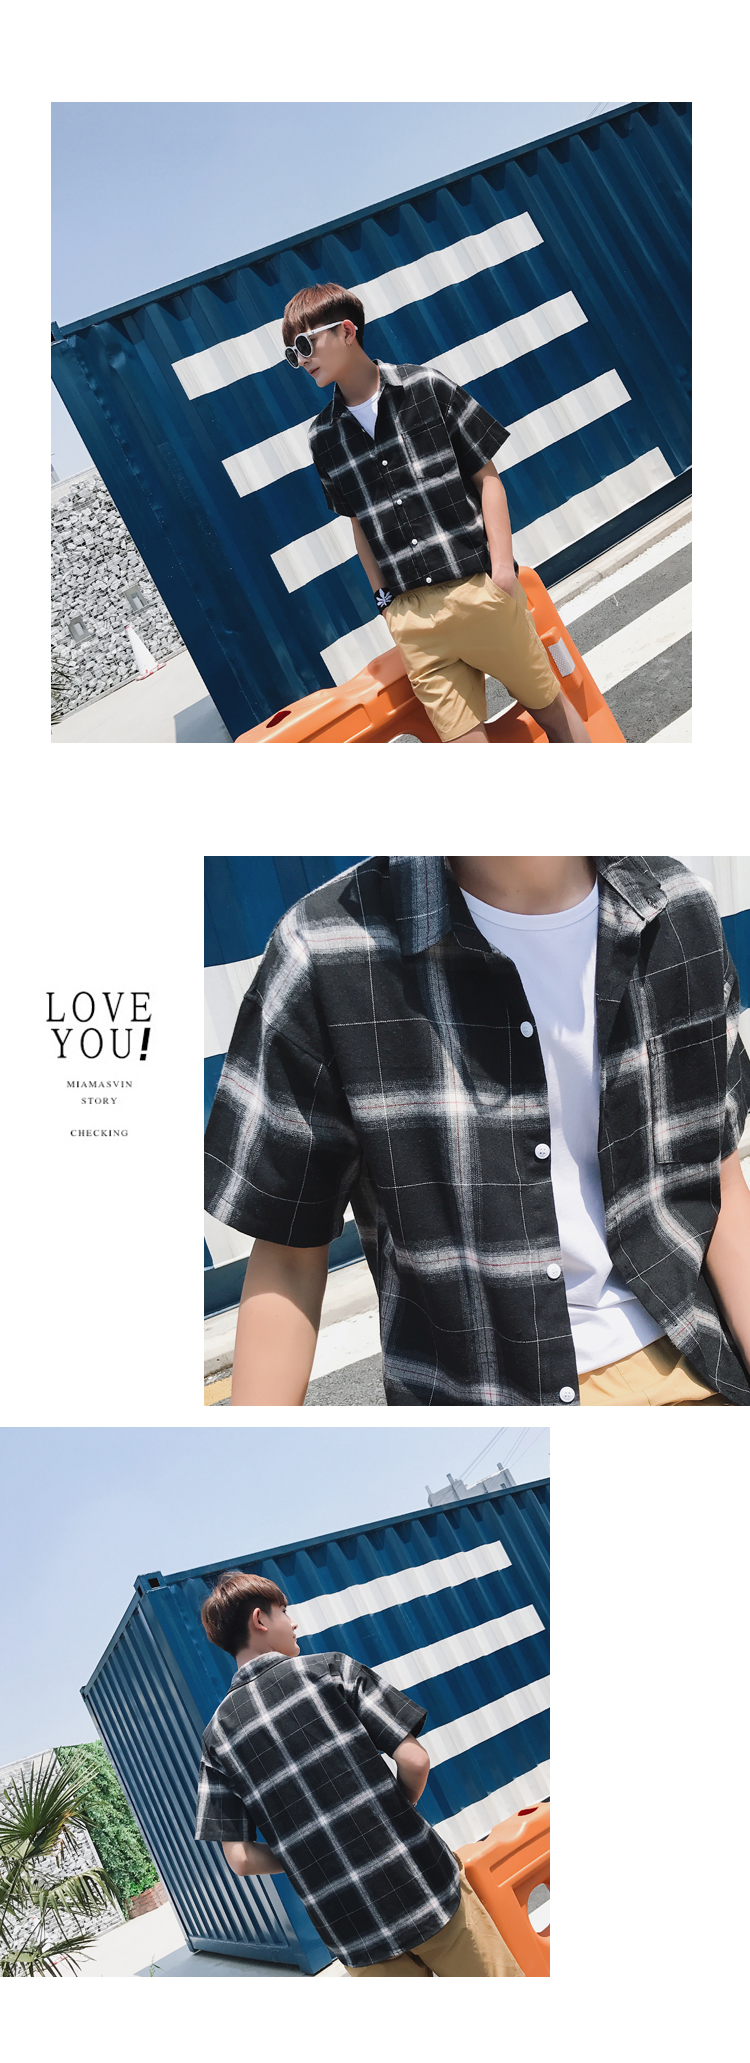 LEGIBLE Men Plaid Short Shirts 2019 Mens Harajuku Streetwear Casual Loose Hip Hop Half Sleeve Shirt Male Fashion 11